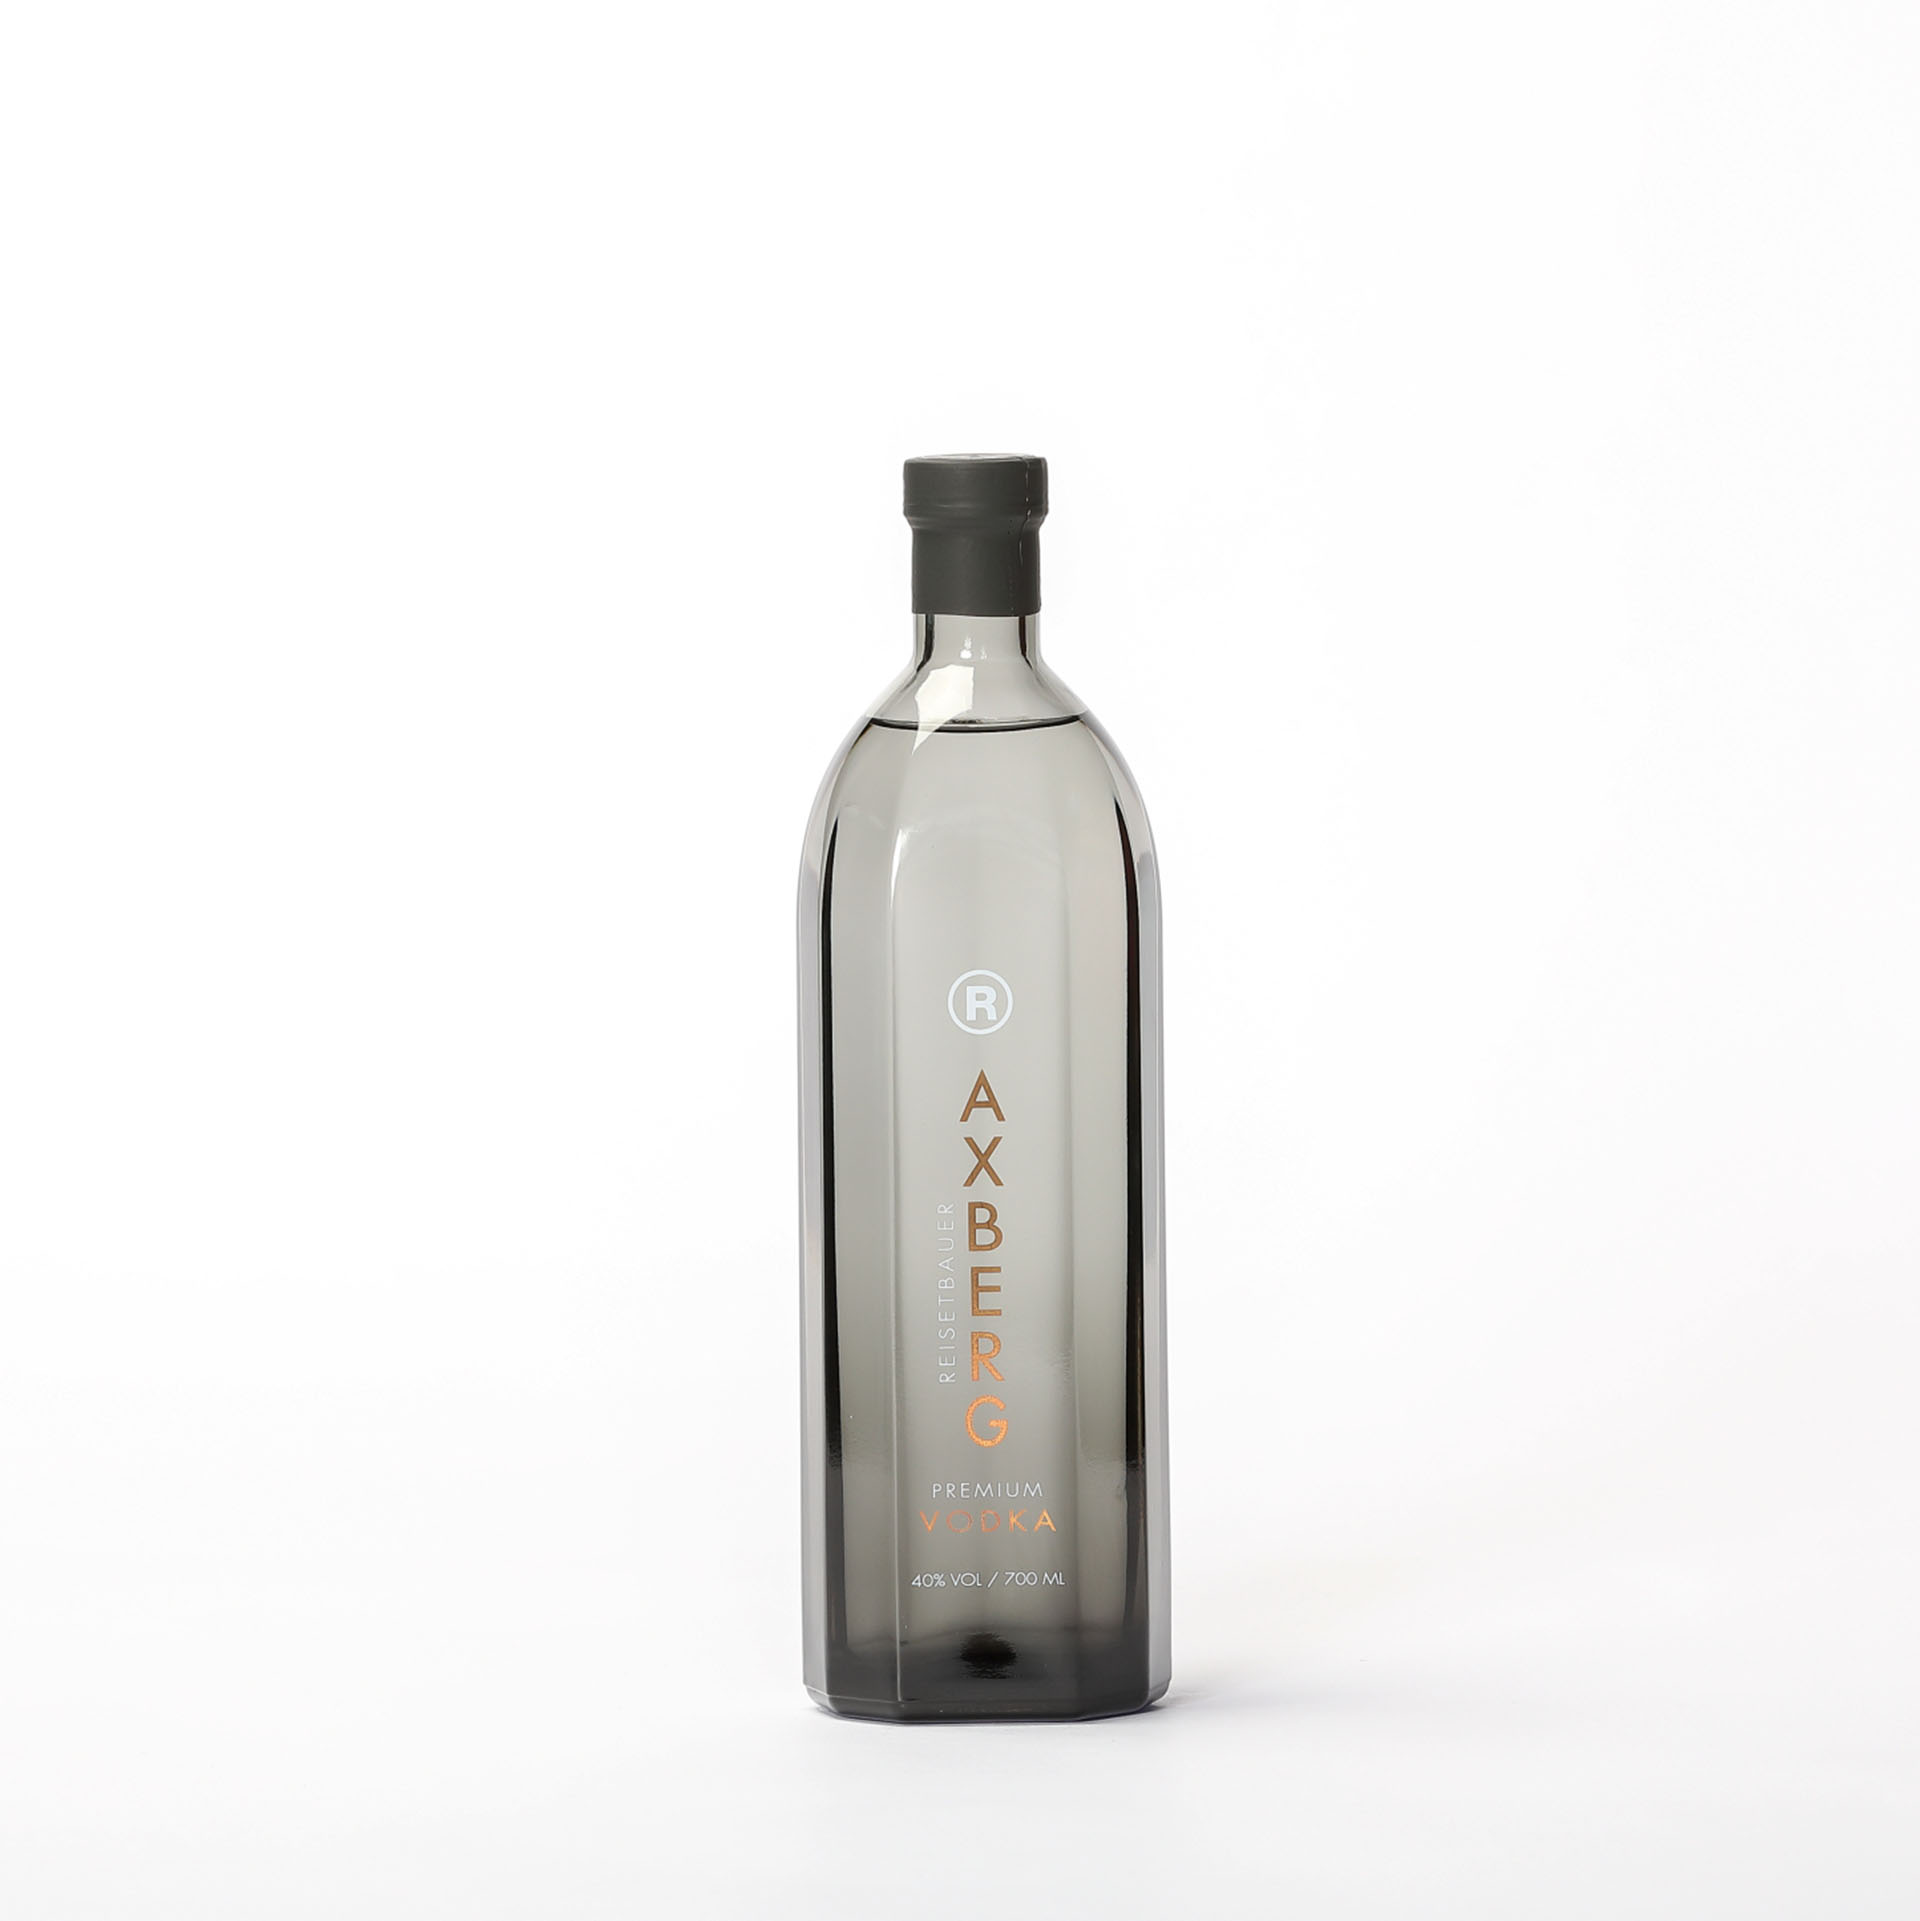 Axberg Vodka - Reisetbauer Qualitätsbrand